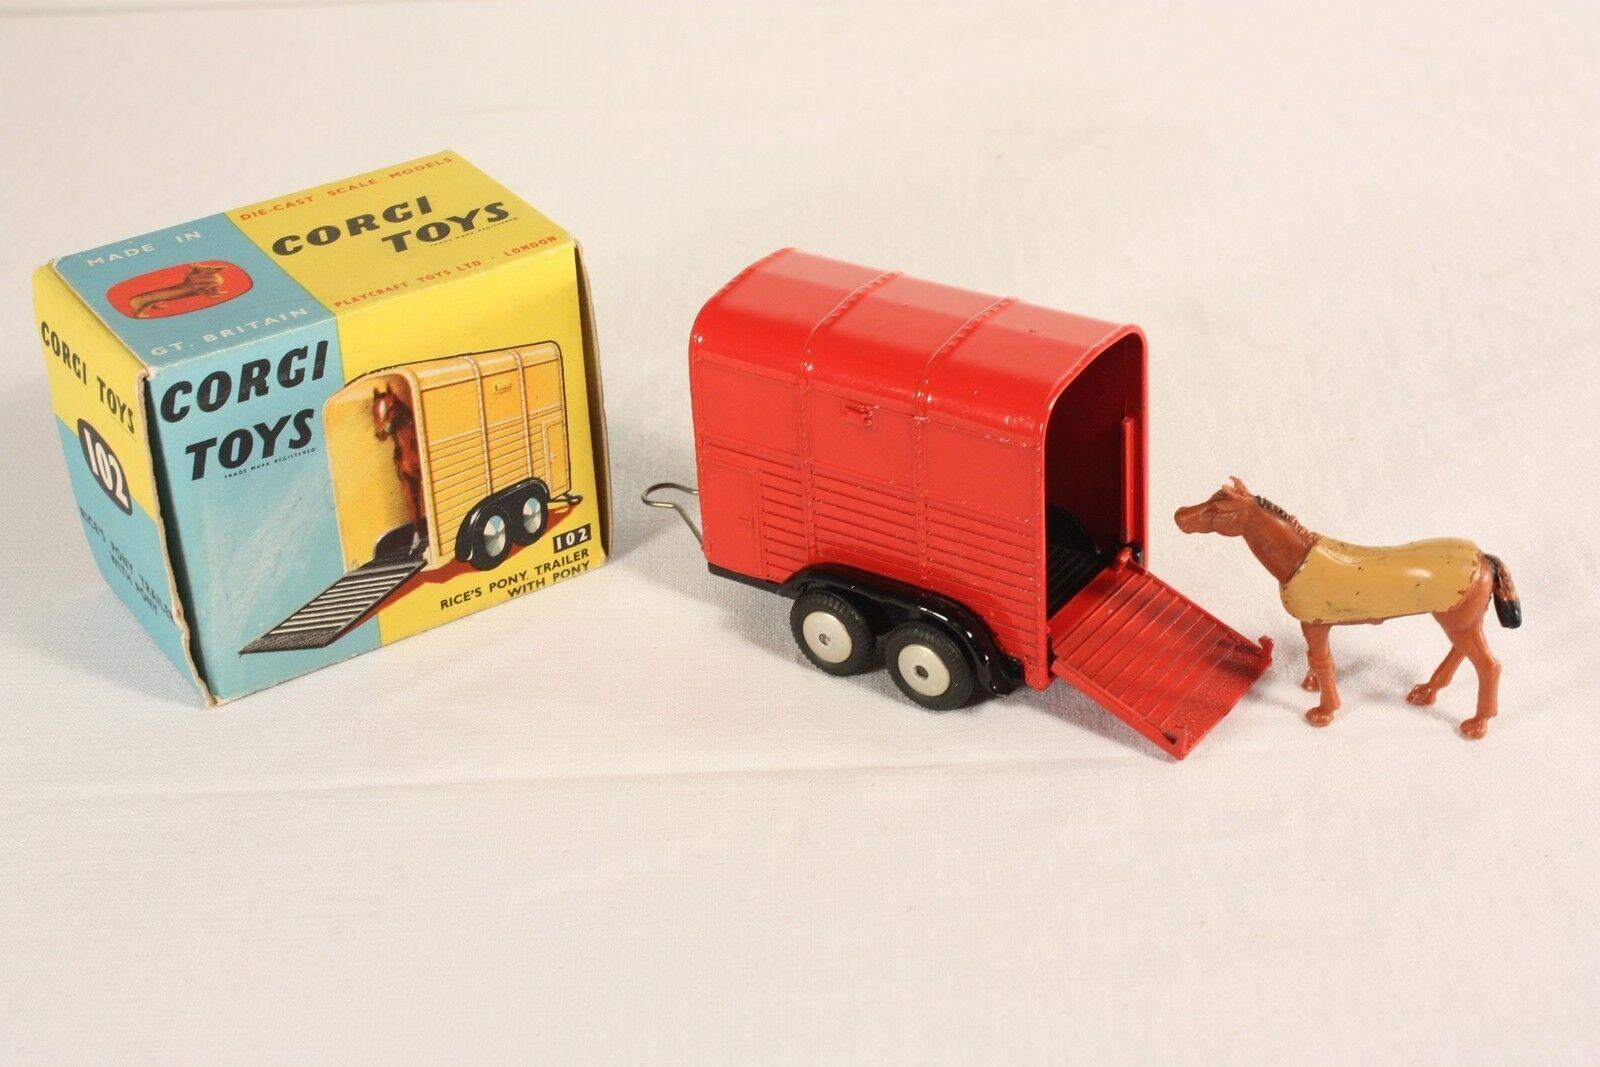 CORGI TOYS 102, RICE'S PONEY Caravane with Poney, Comme neuf Dans Box  ab563